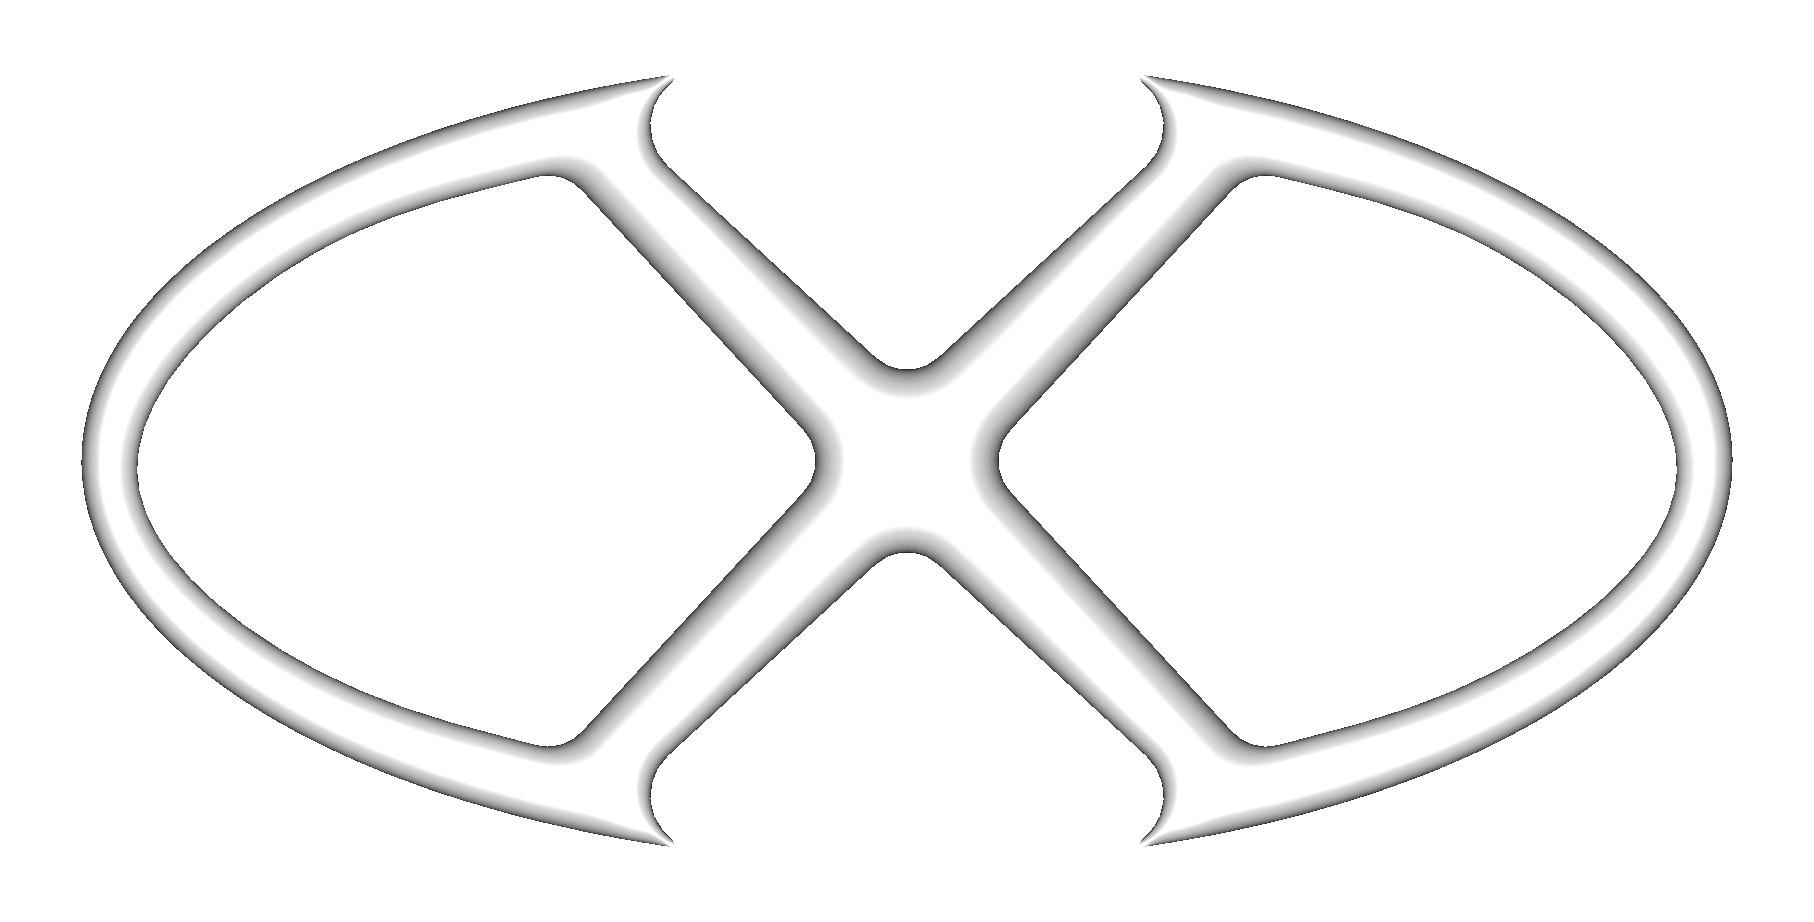 Chrysler Hemi Drive By Wire throttle body flange